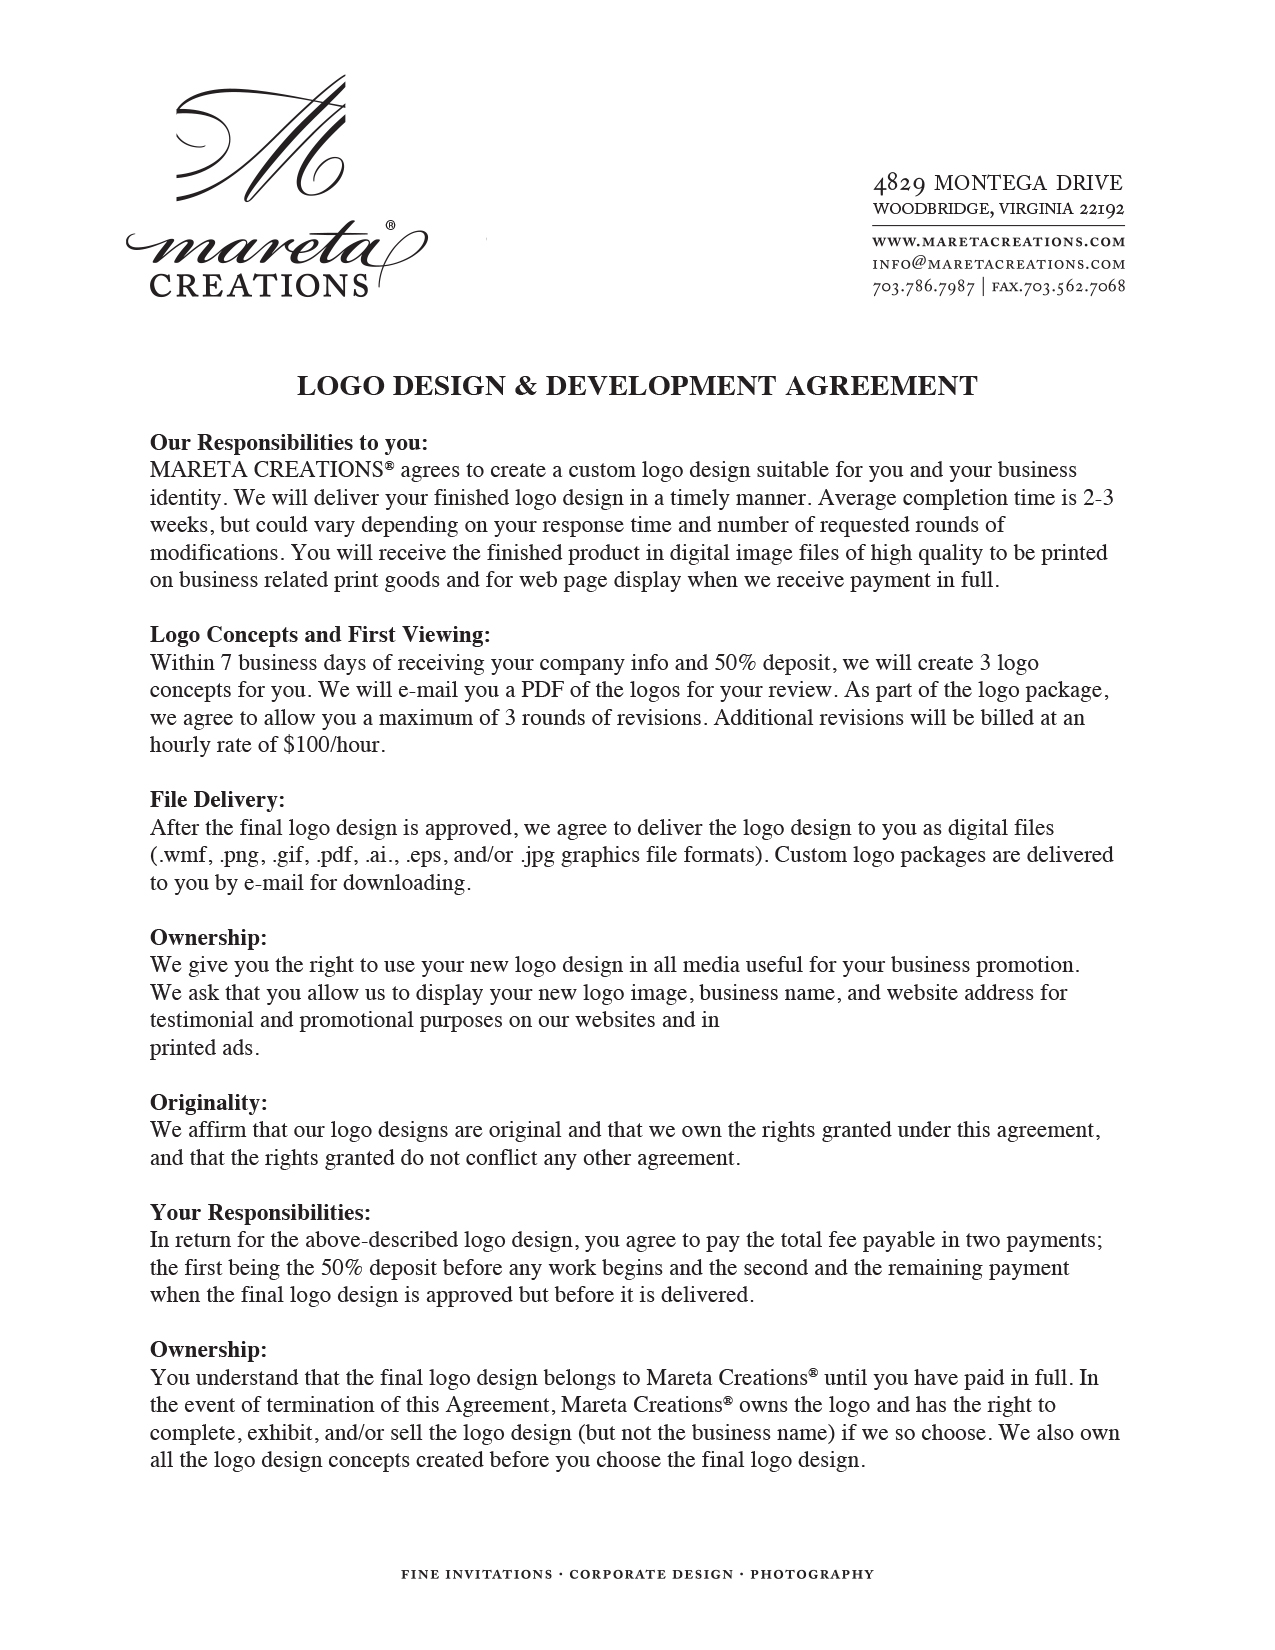 MaretaCreations-LogoAgreement.jpg